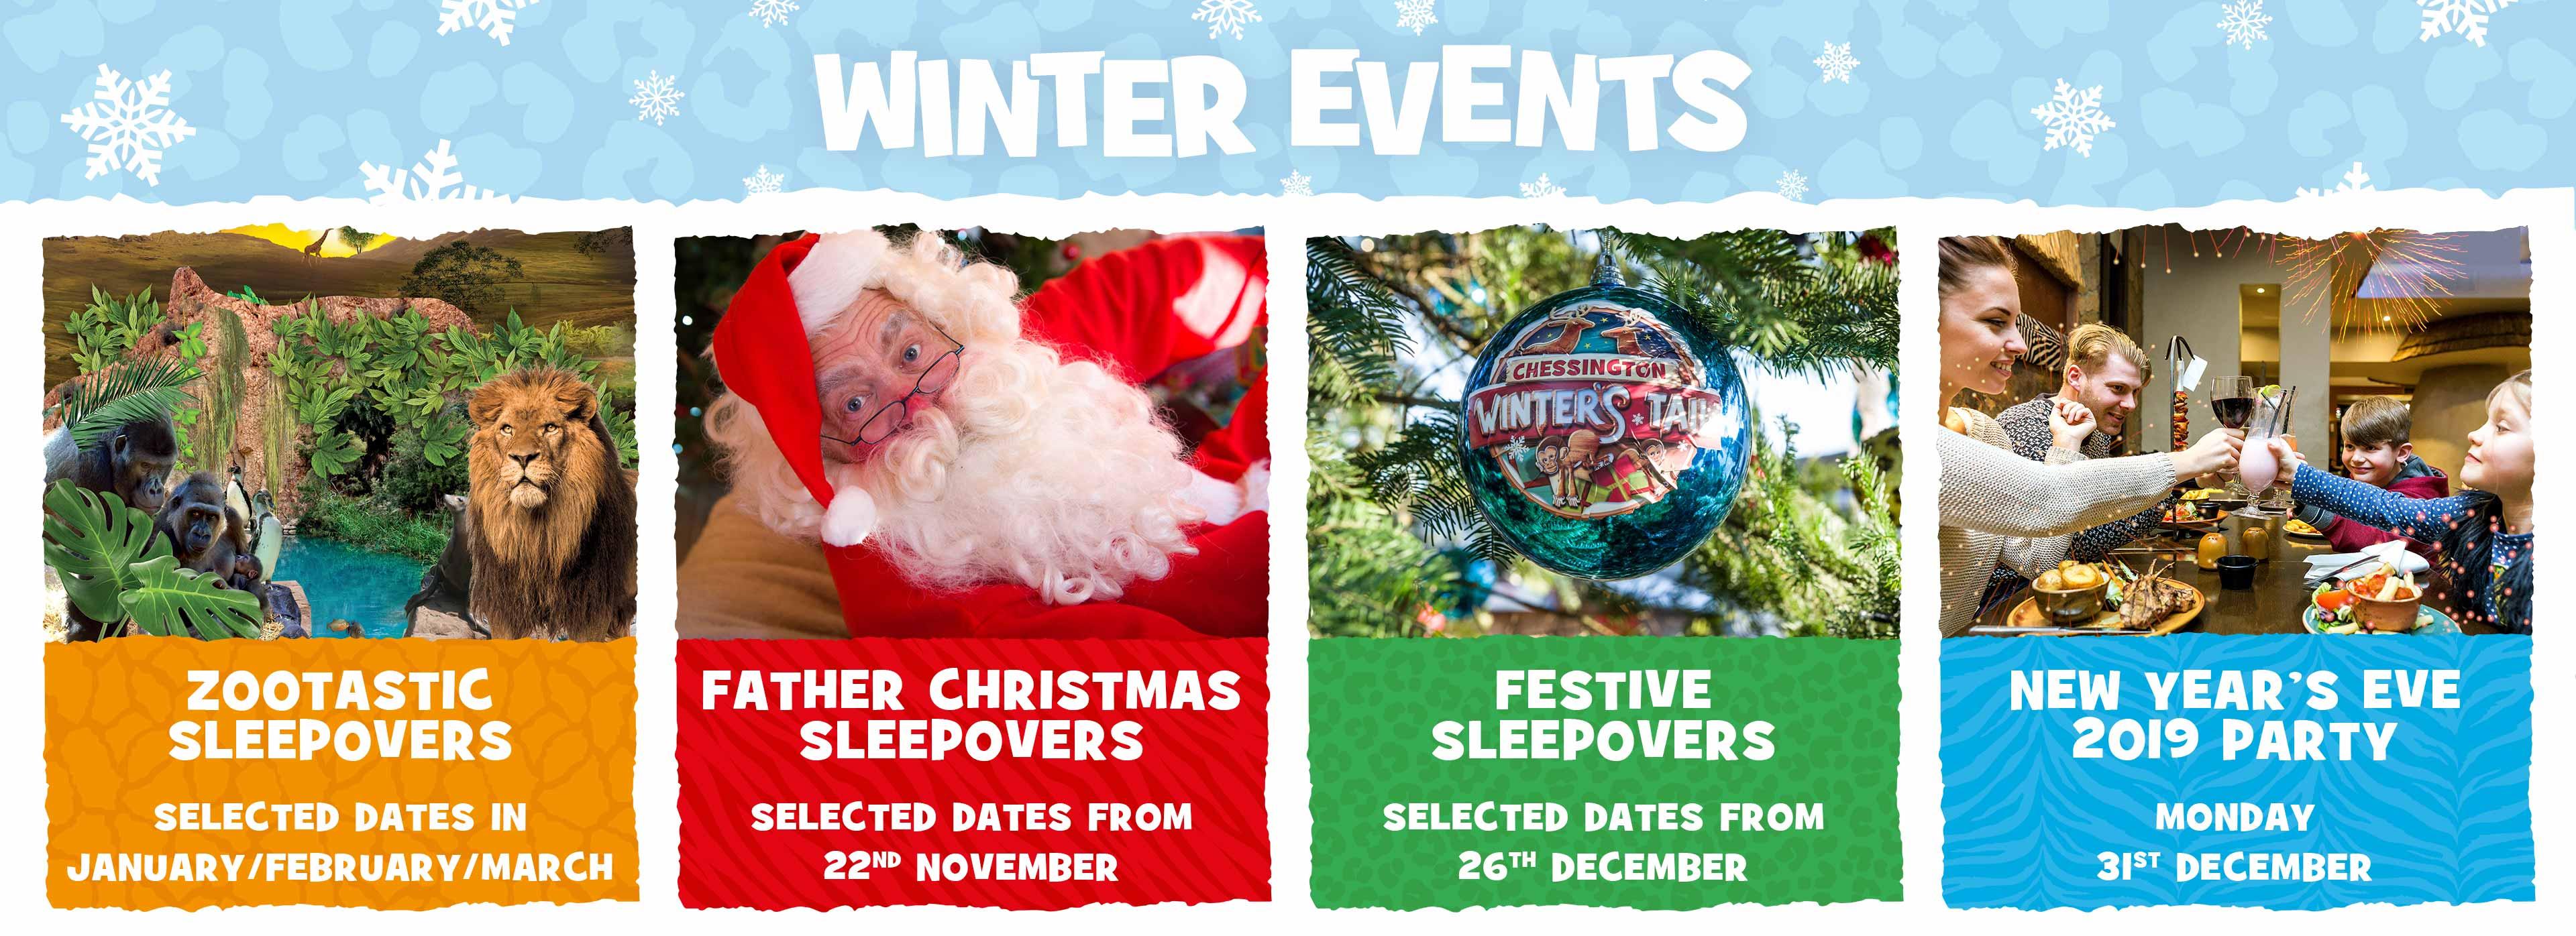 Winter Events at Chessington World of Adventures Resort